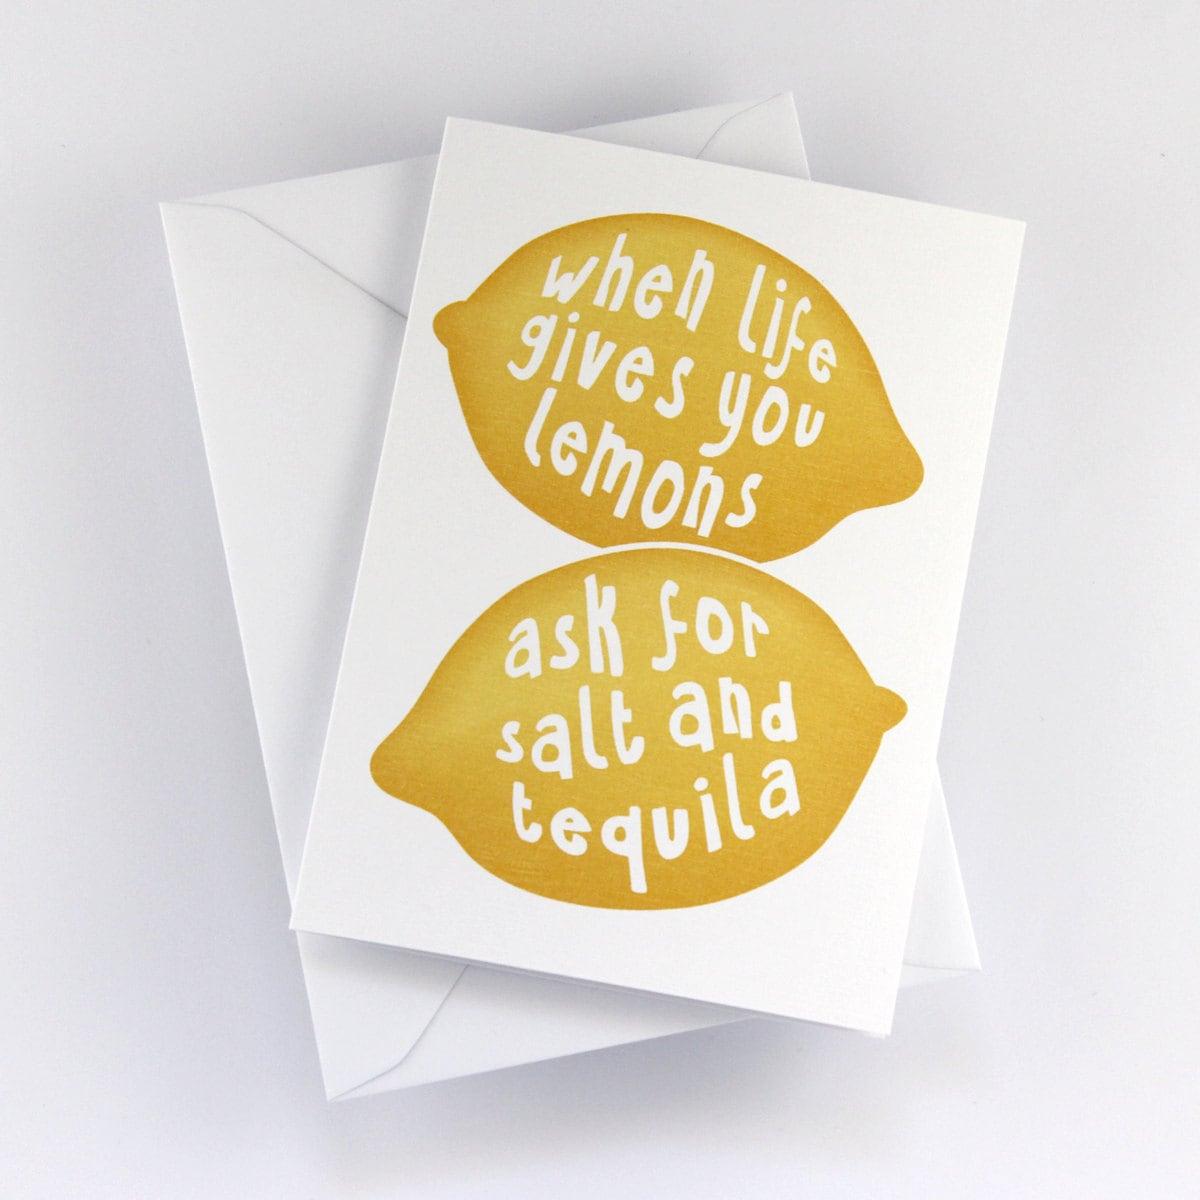 Greeting Card When Life Gives You Lemons Ask For Salt